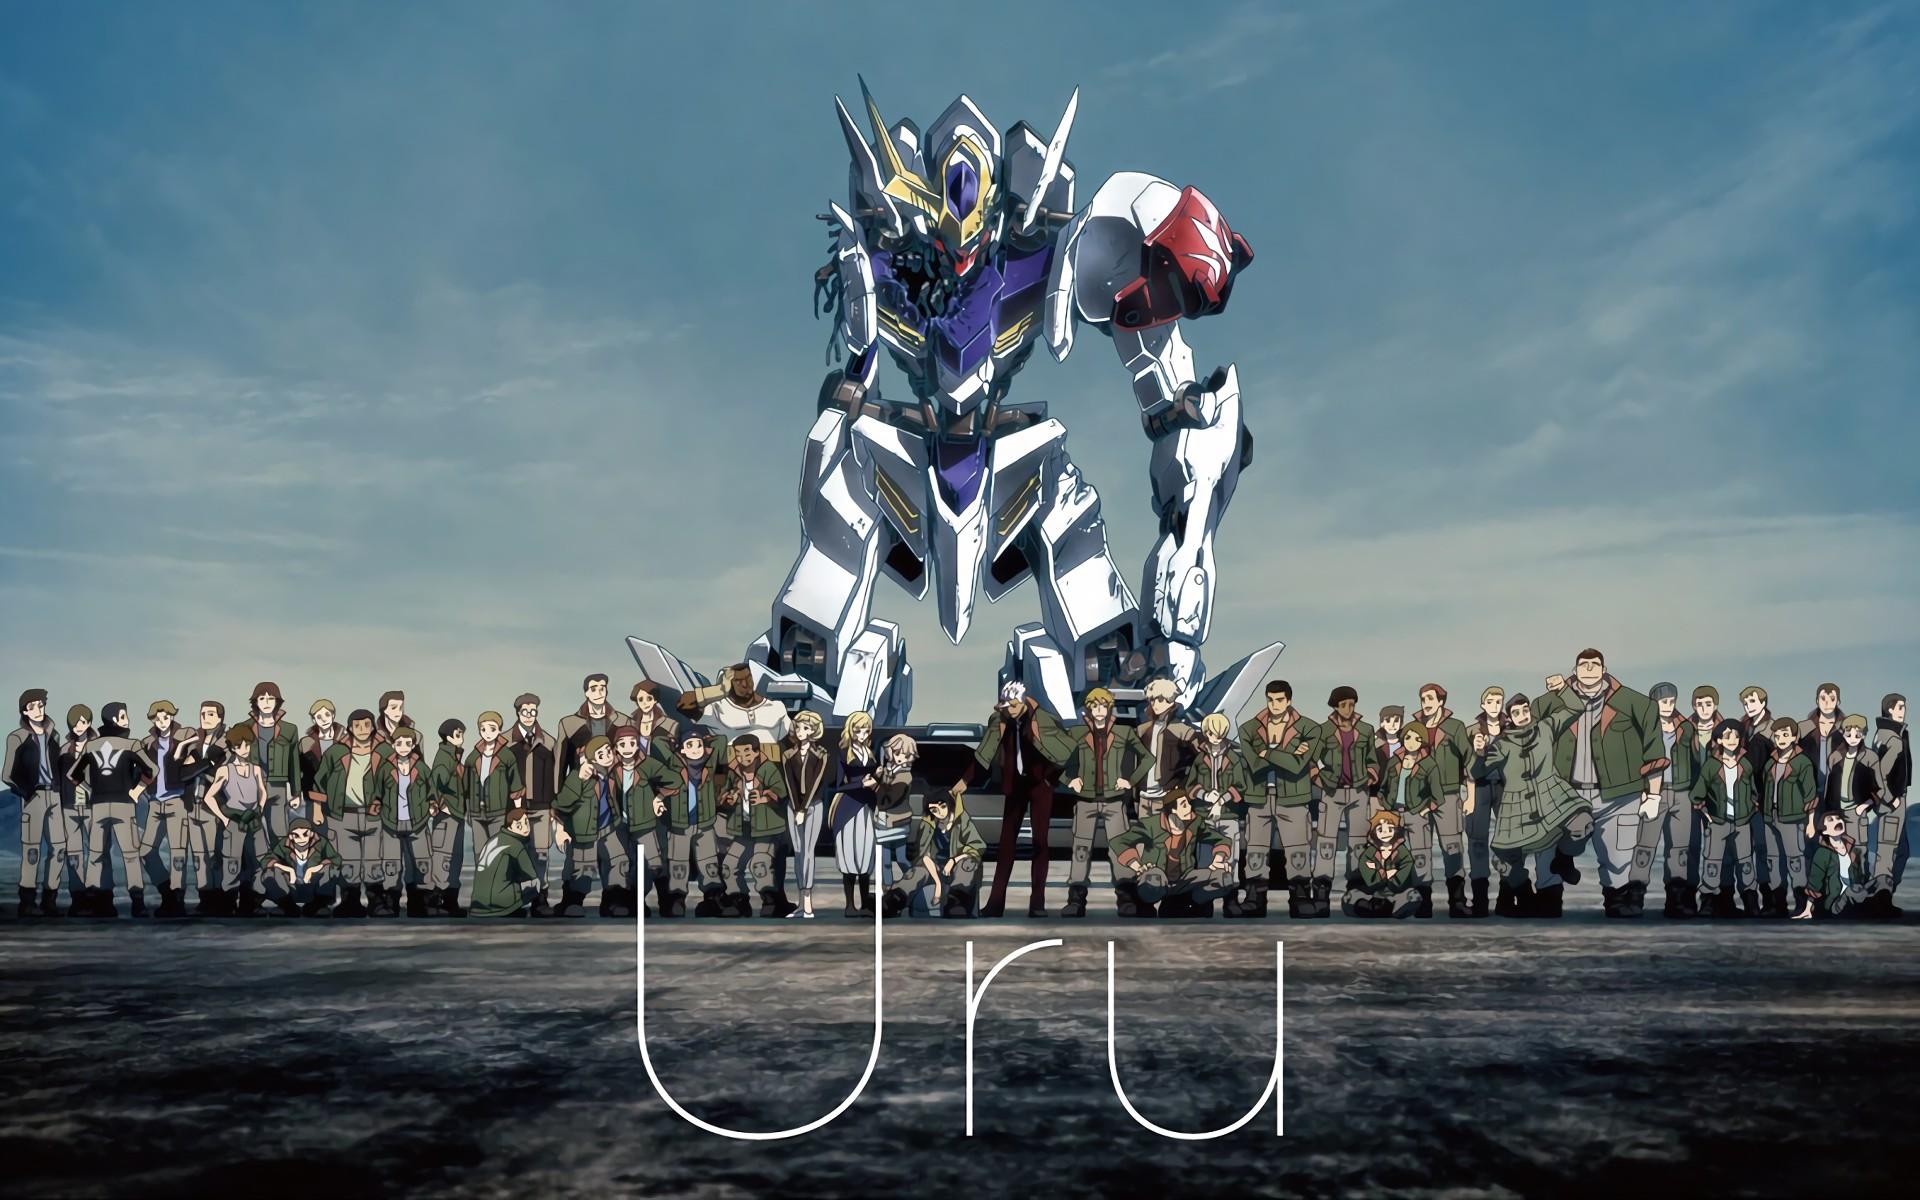 Hd Gundam Themes: Gundam Barbatos Wallpaper ·① Download Free Cool Full HD